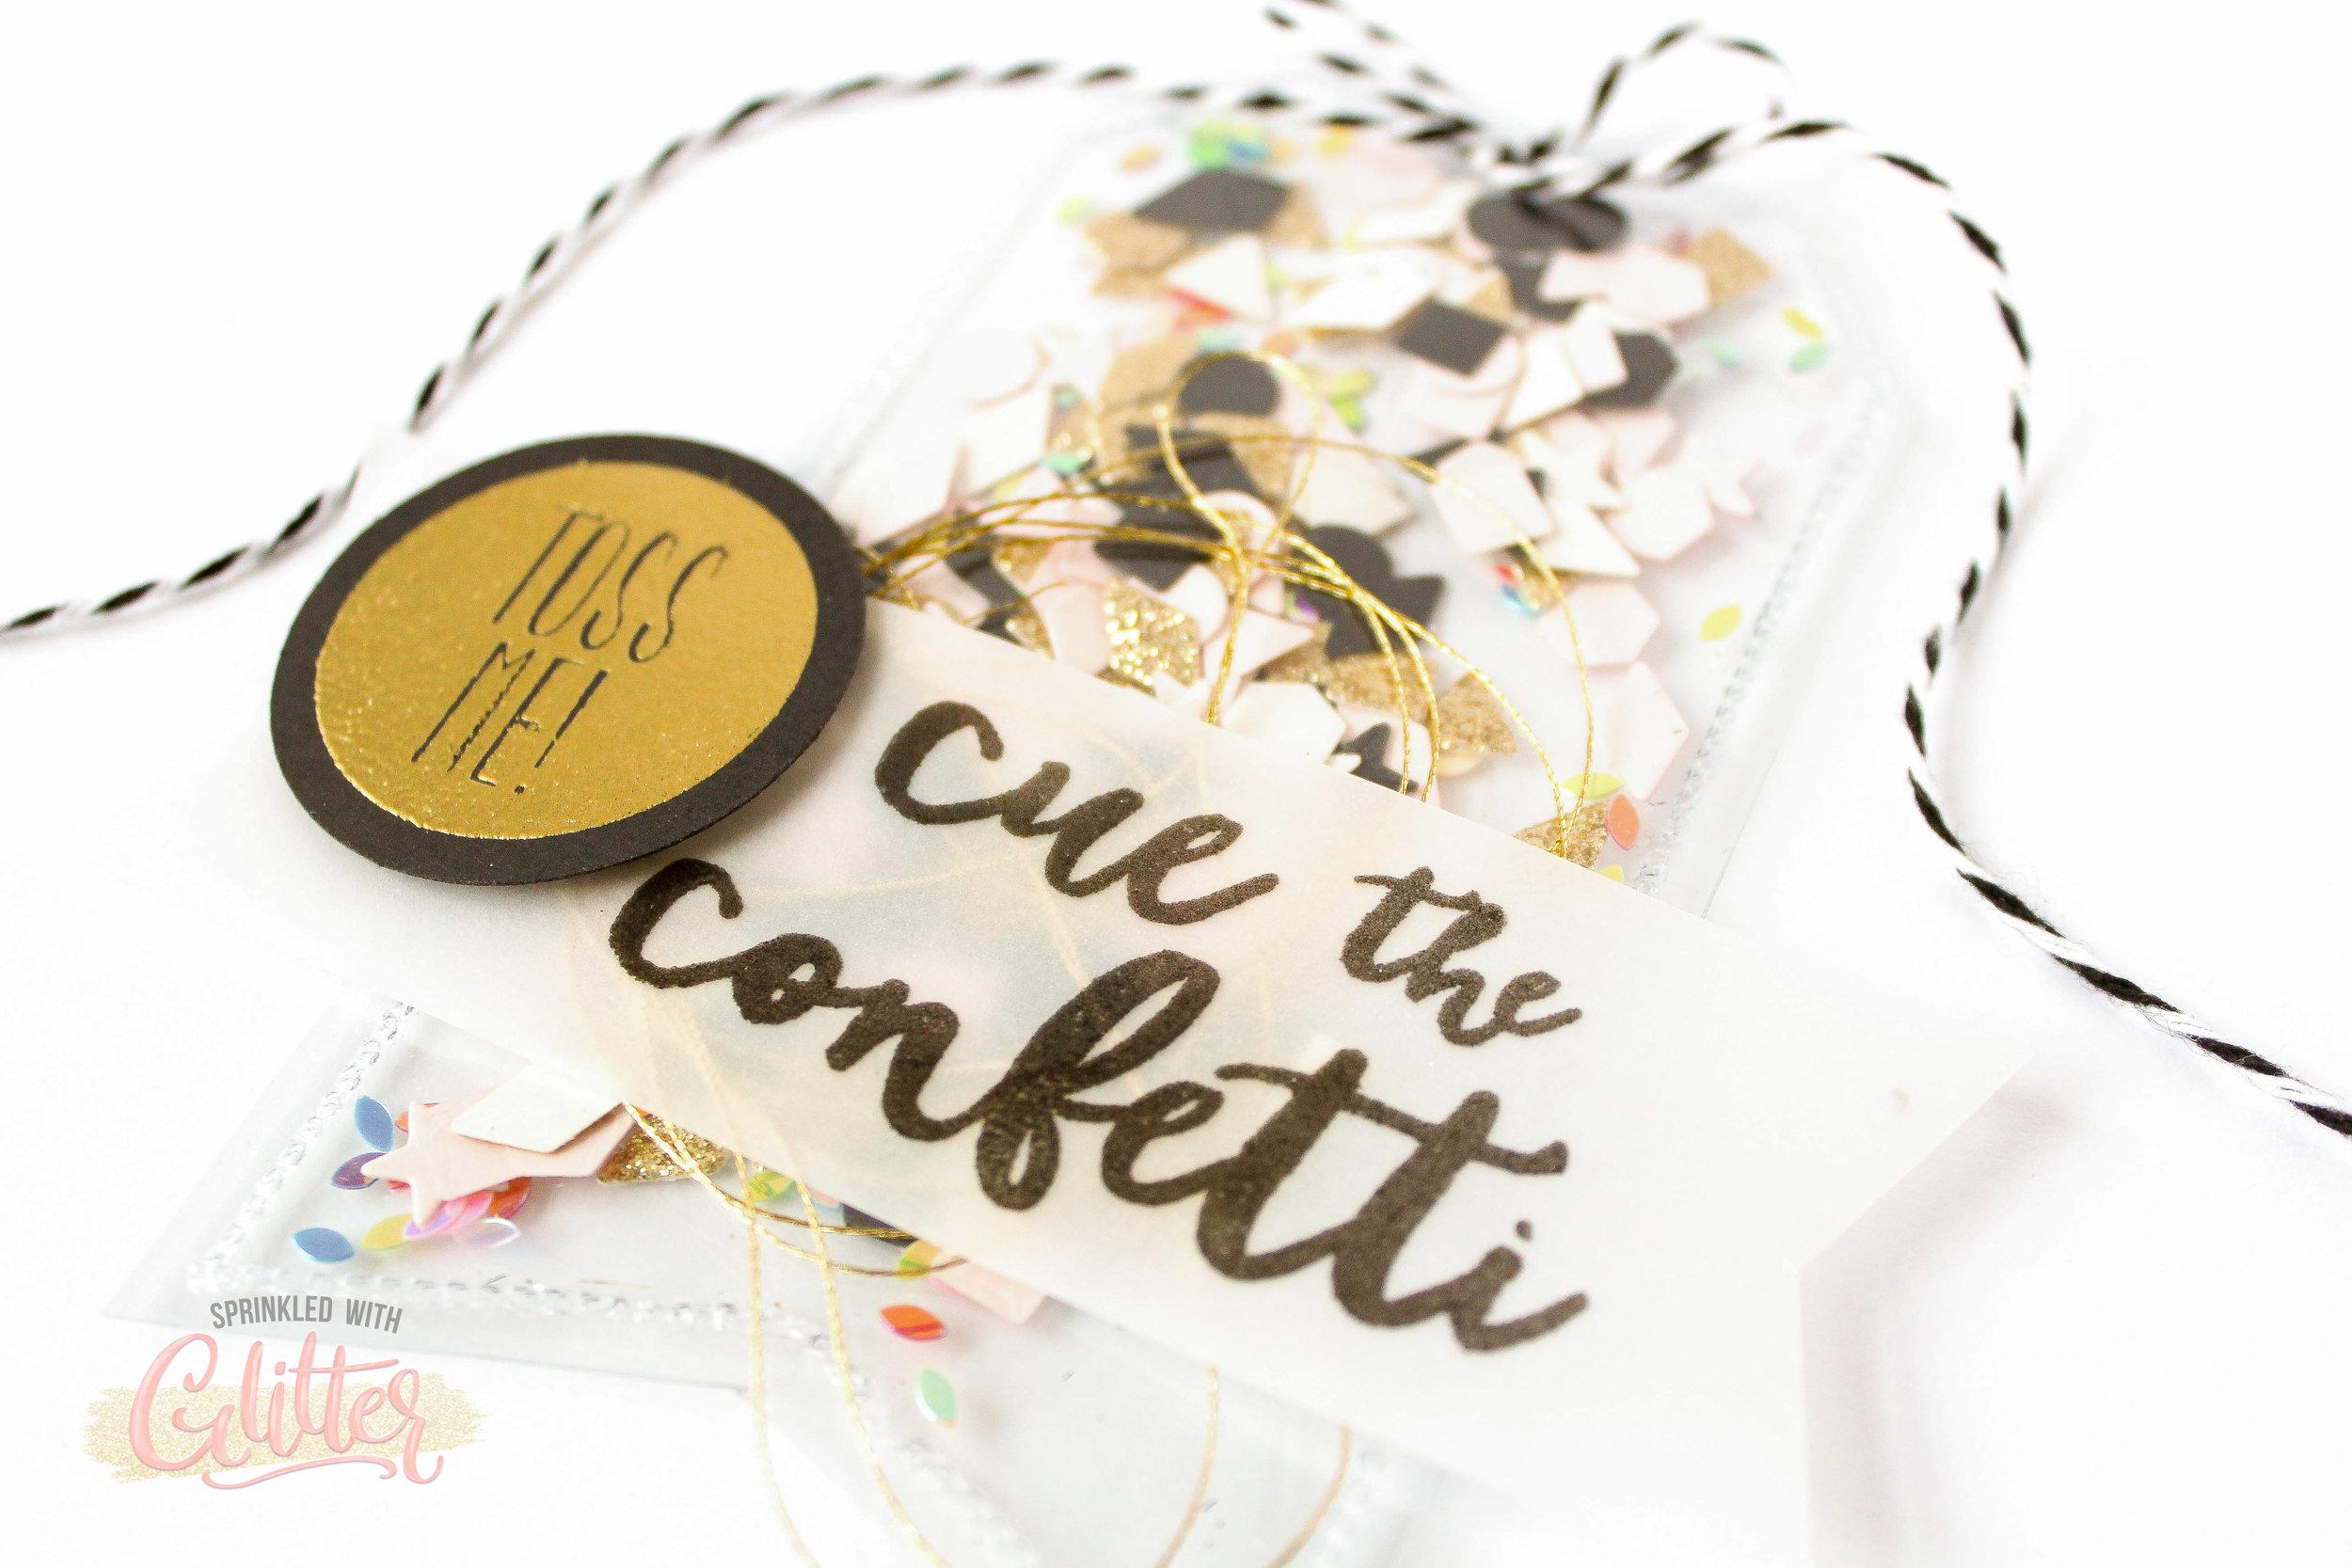 Confetti shaker tags watermark-18.jpg